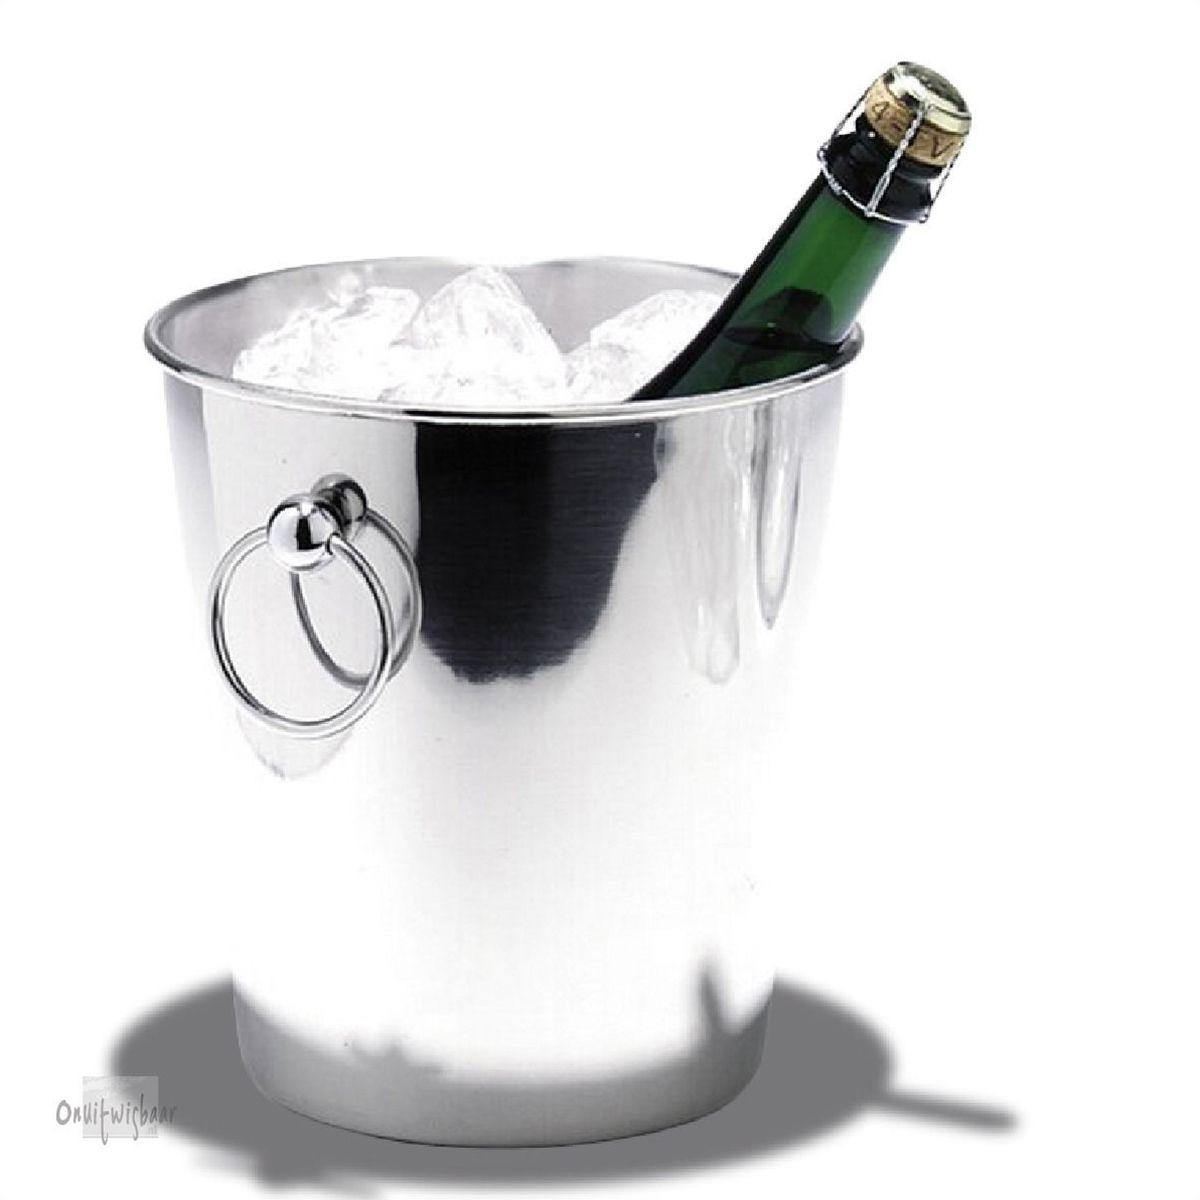 champagnekoeler op standaard